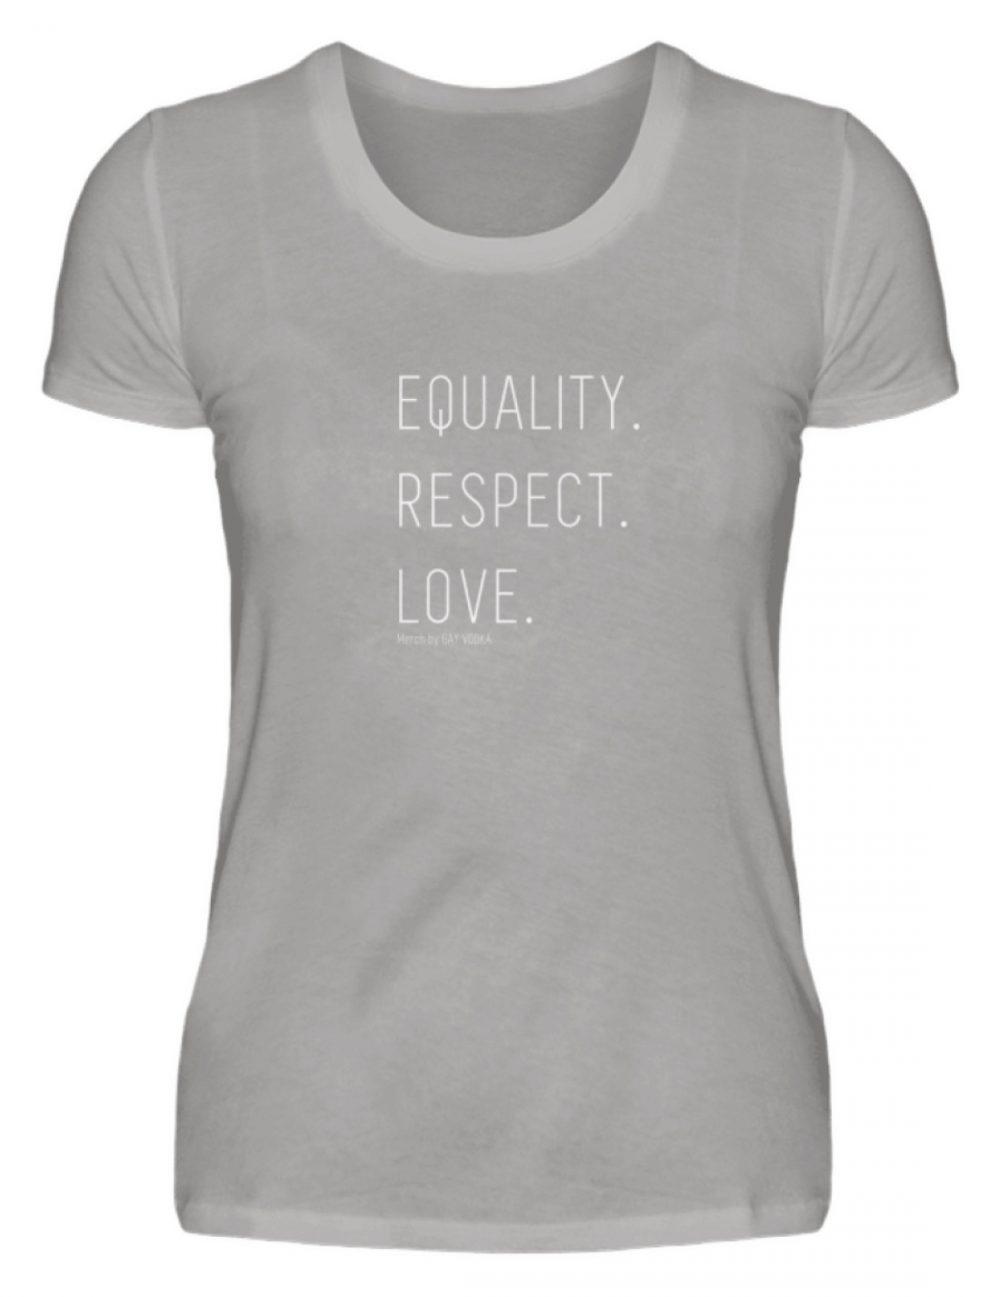 EQUALITY. RESPECT. LOVE. - Damen Premiumshirt-2998